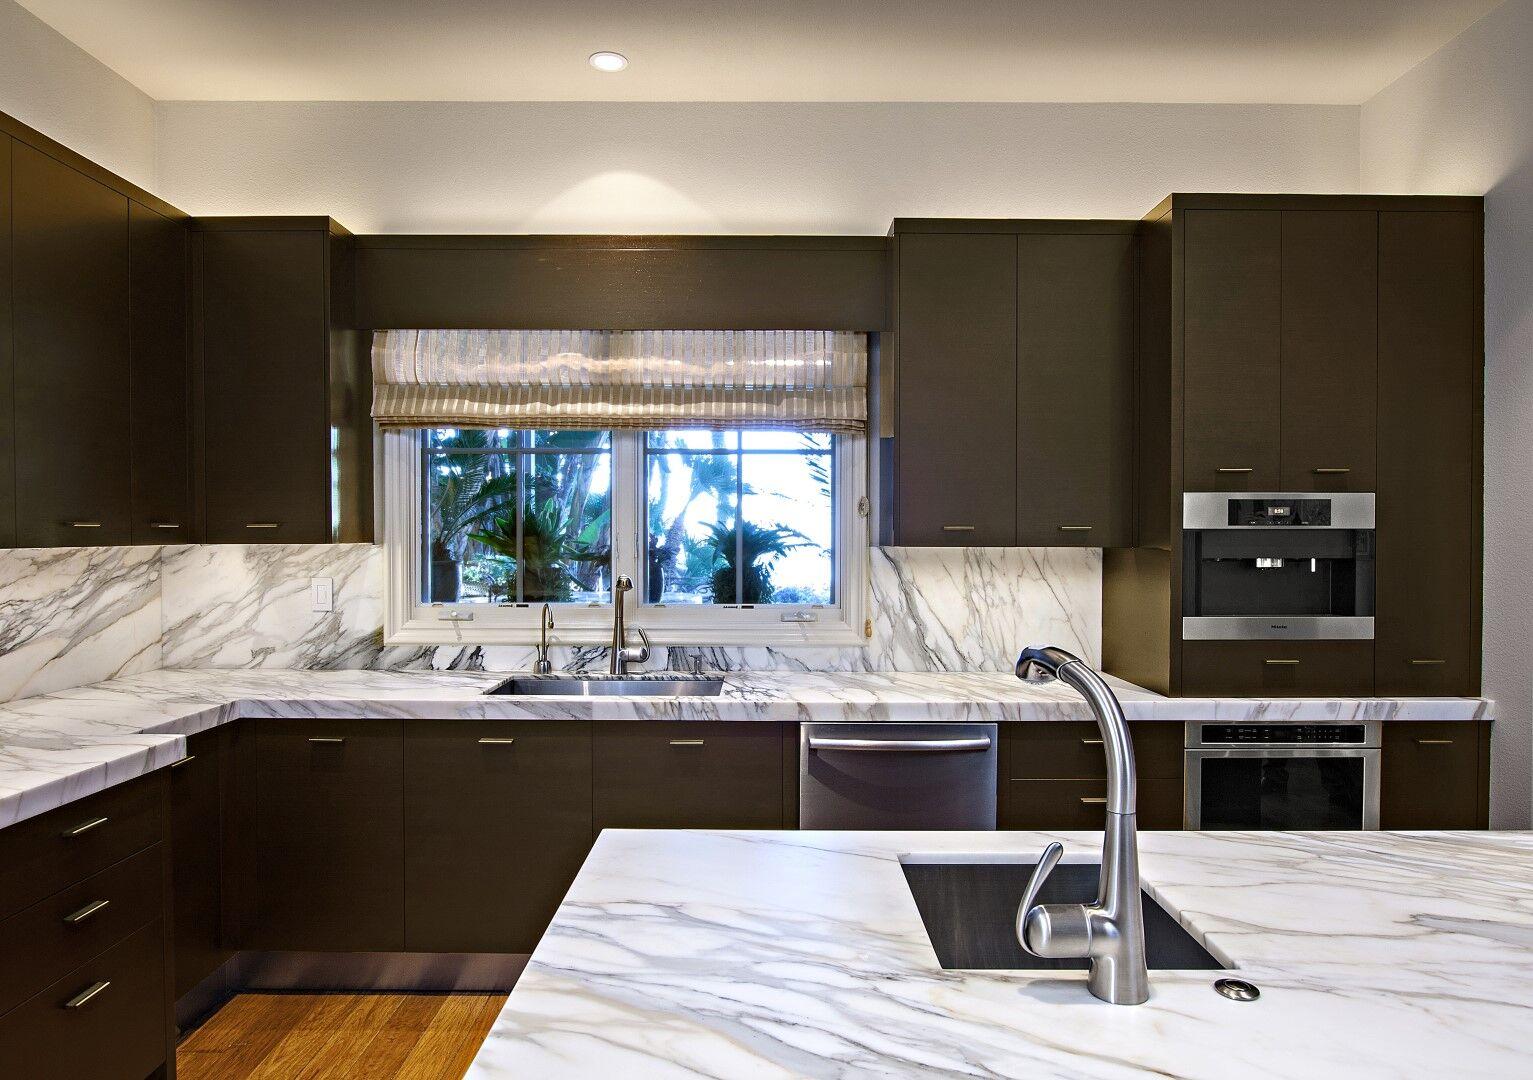 Kitchen Remodeling Orange County  Custom Kitchen Cabinets